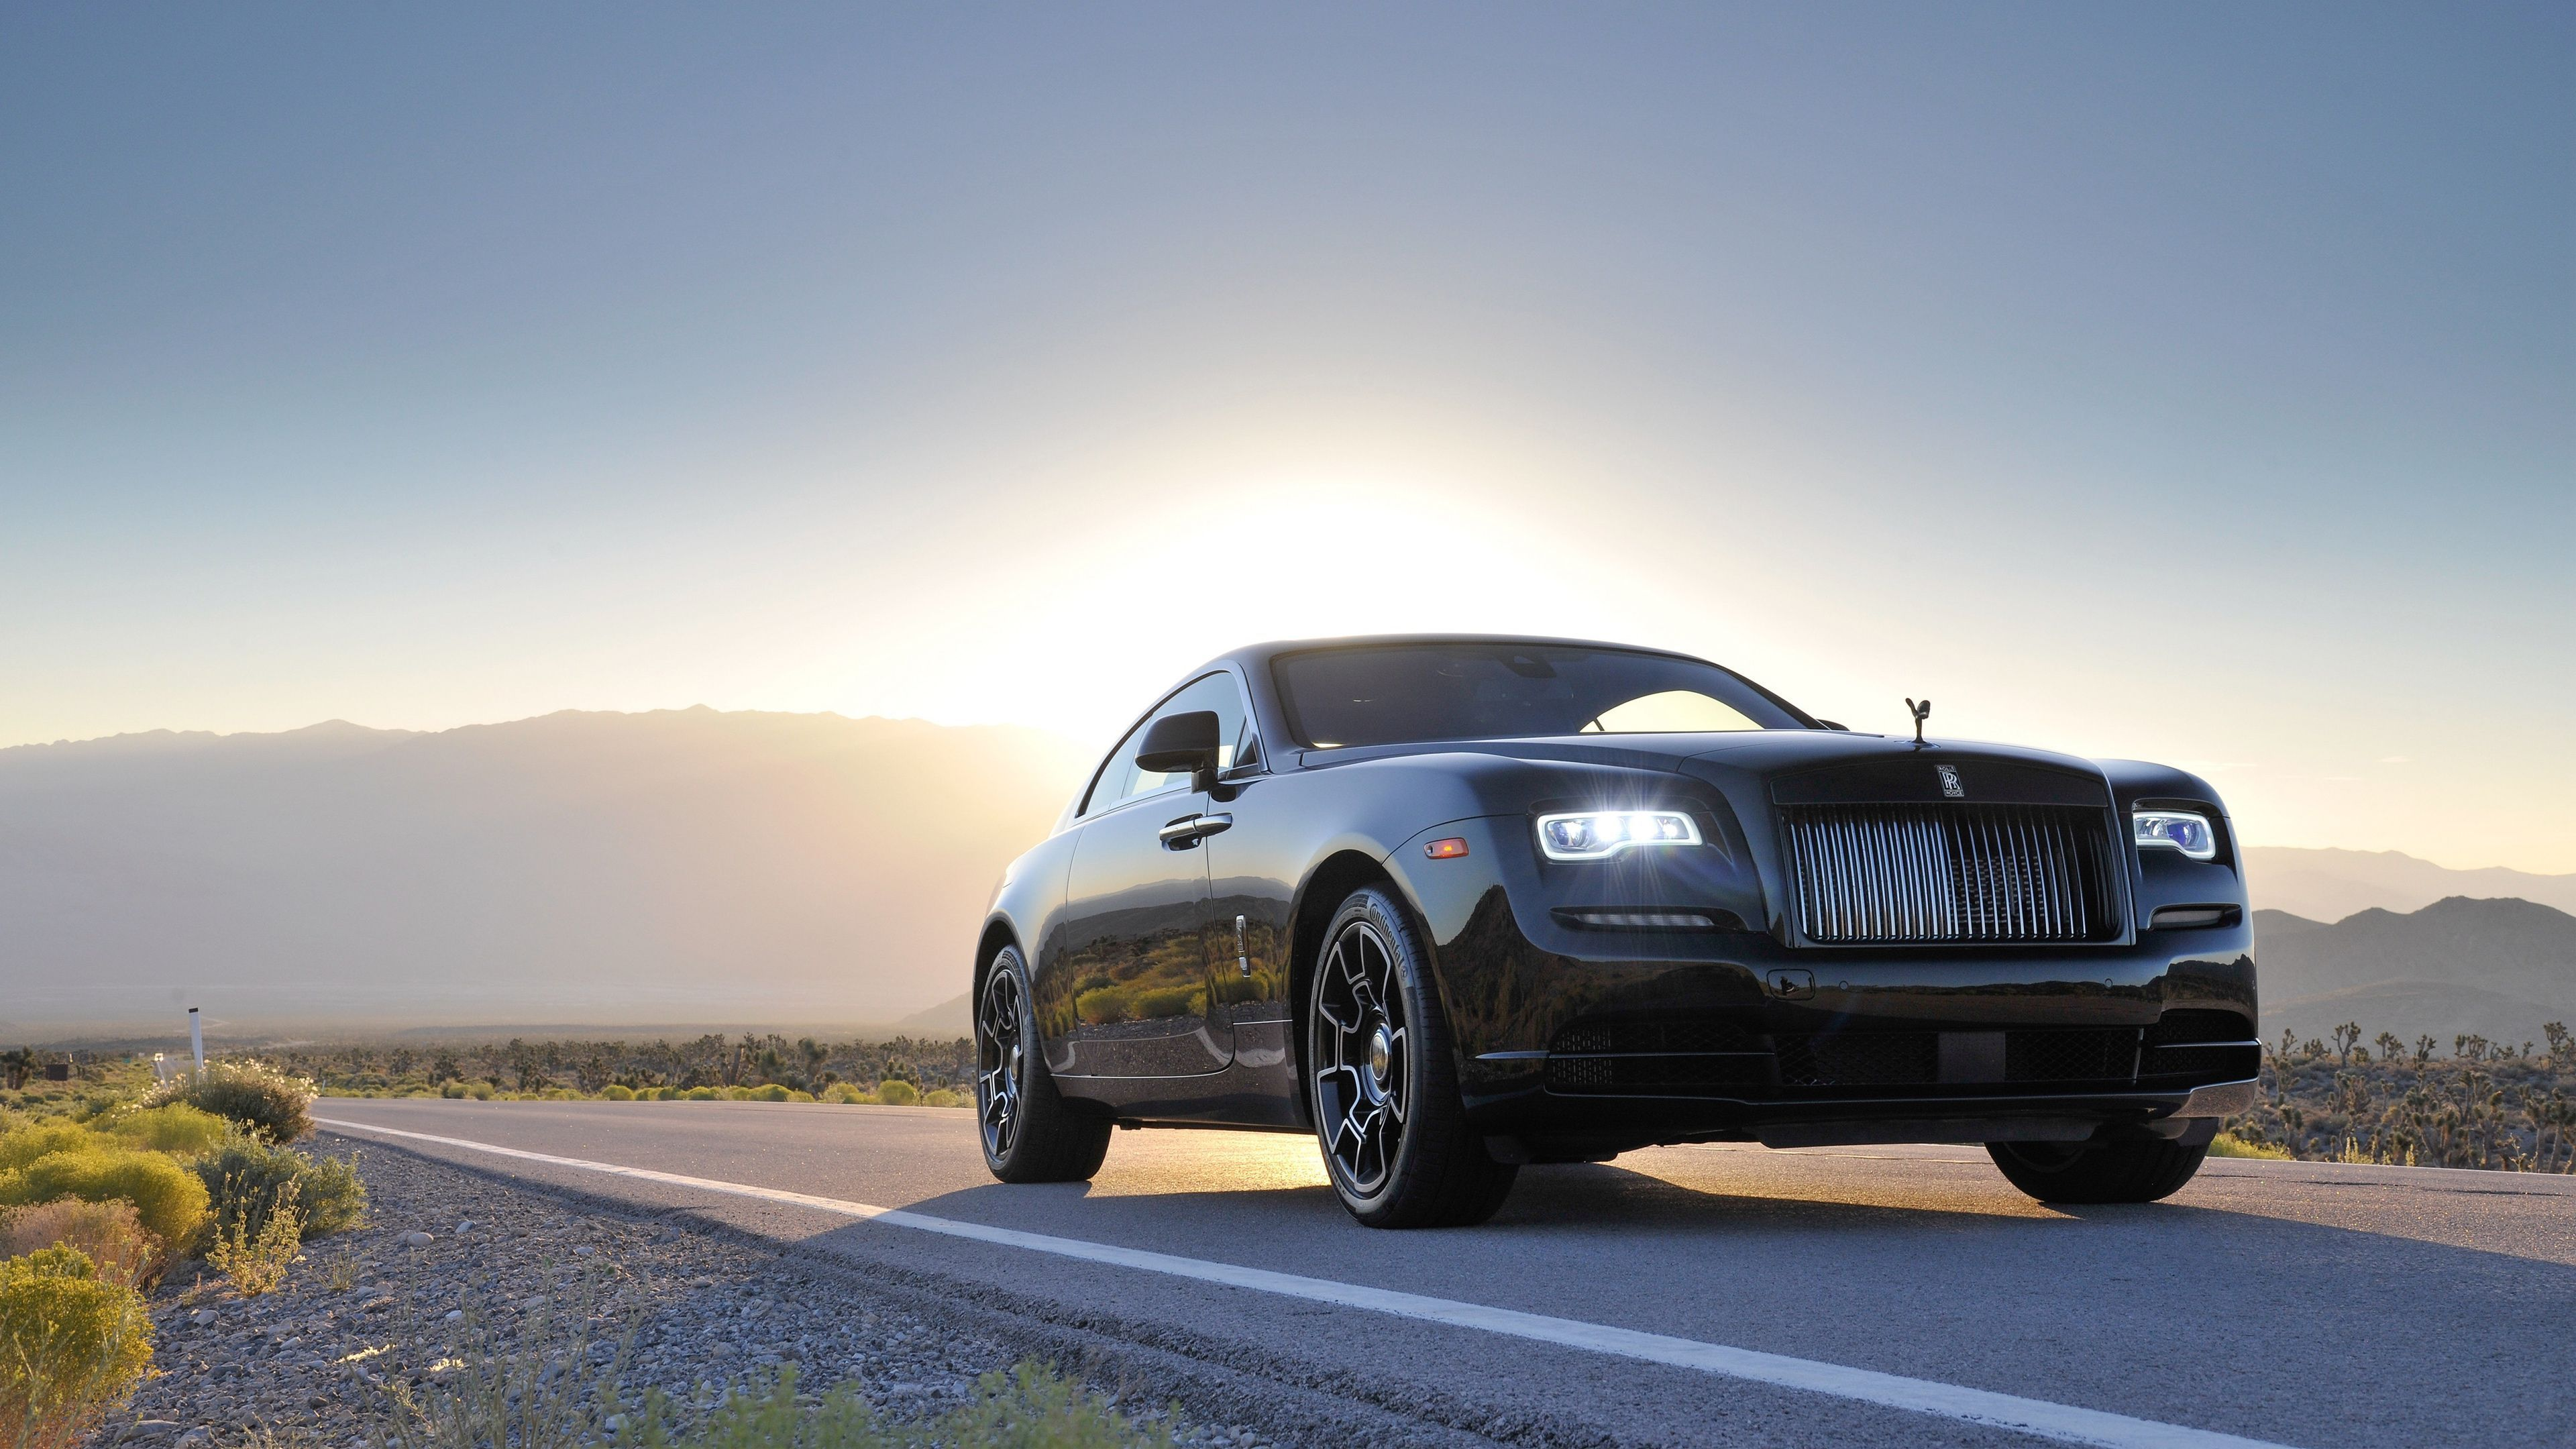 Rolls Royce Wraith Black Badge 4k Wallpaper Hd Car Wallpapers Id Rolls Royce Wraith Rolls Royce Rolls Royce Wraith Black